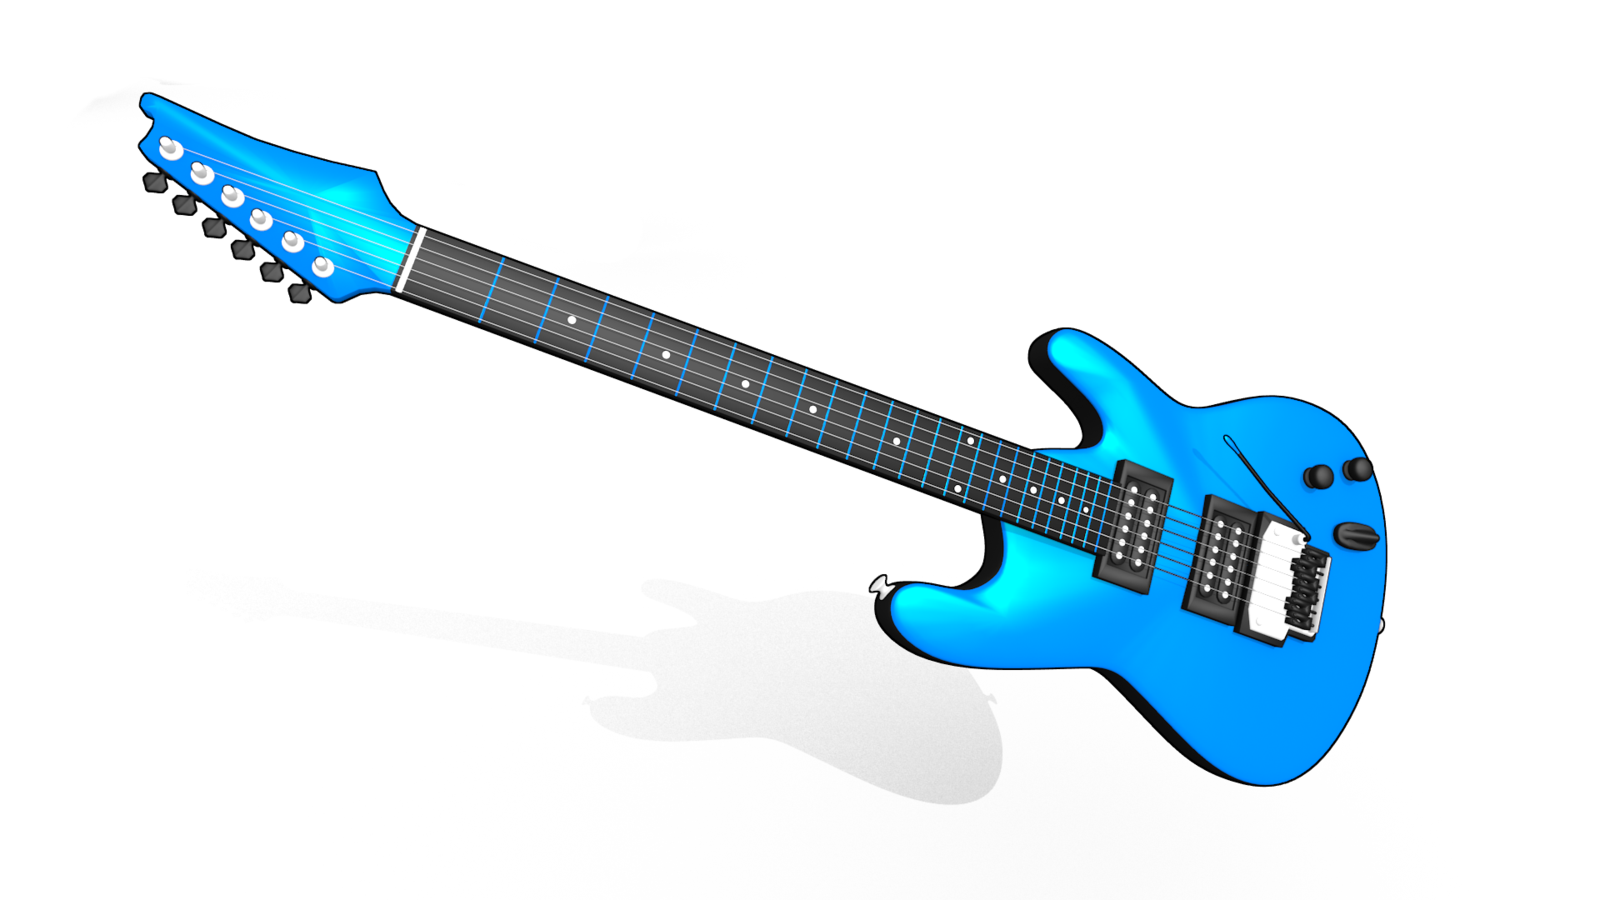 Electric Guitar Png Image Electric Guitar Guitar Png Images